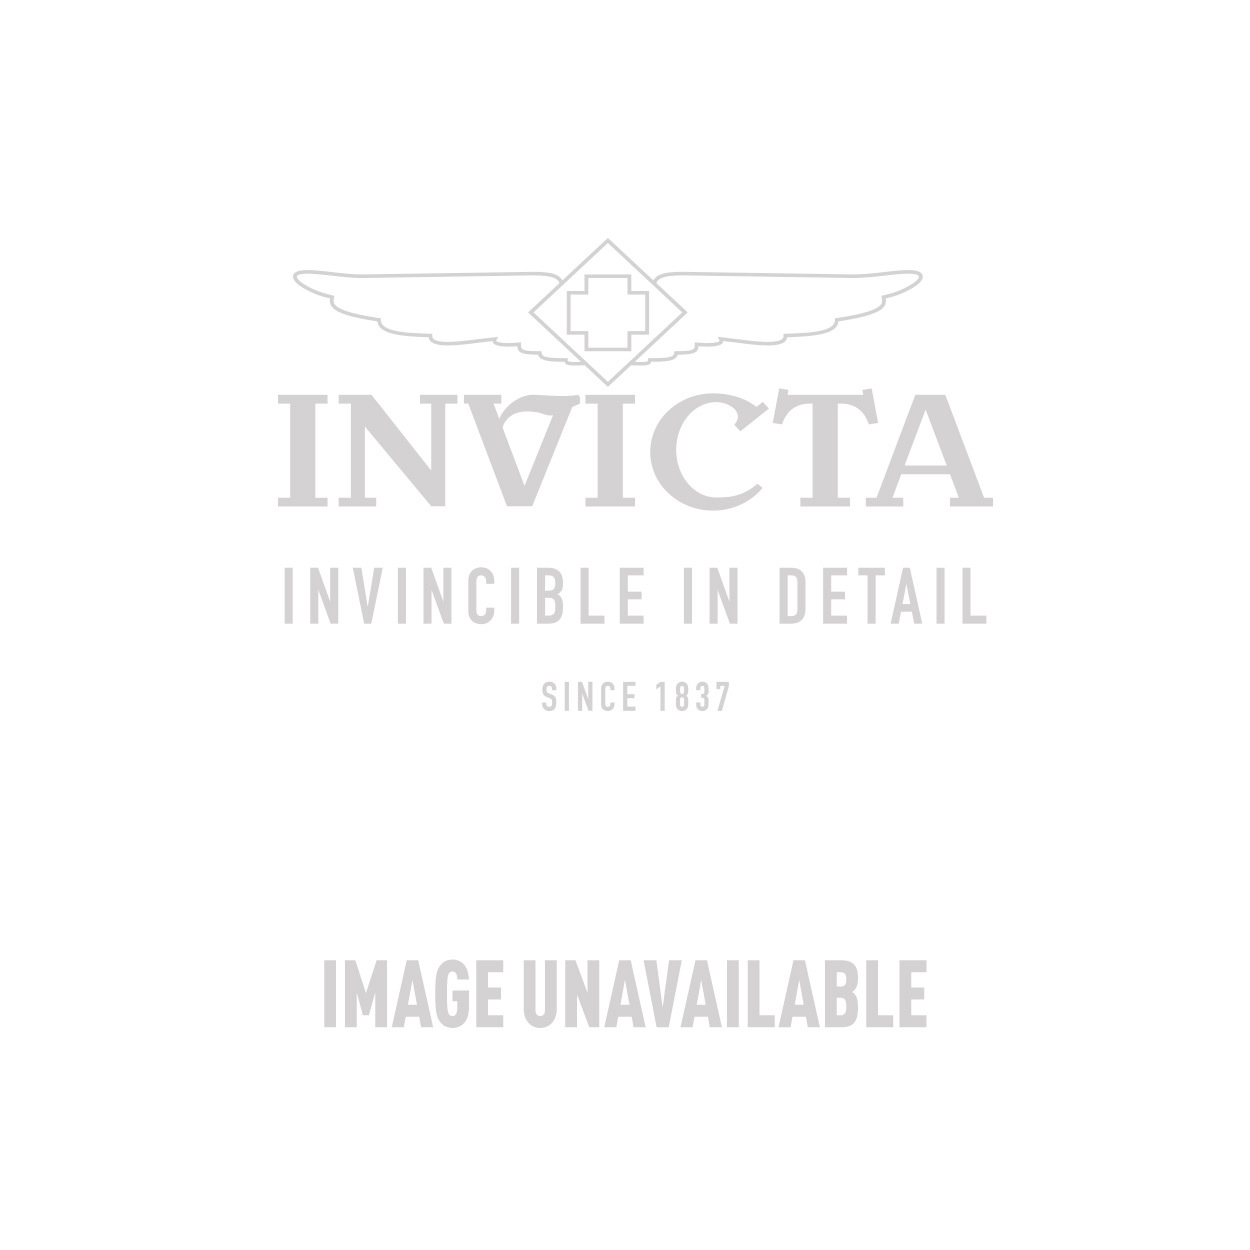 Invicta Sea Hunter  Quartz Watch - Rose Gold, Black case with White tone Leather band - Model 12181